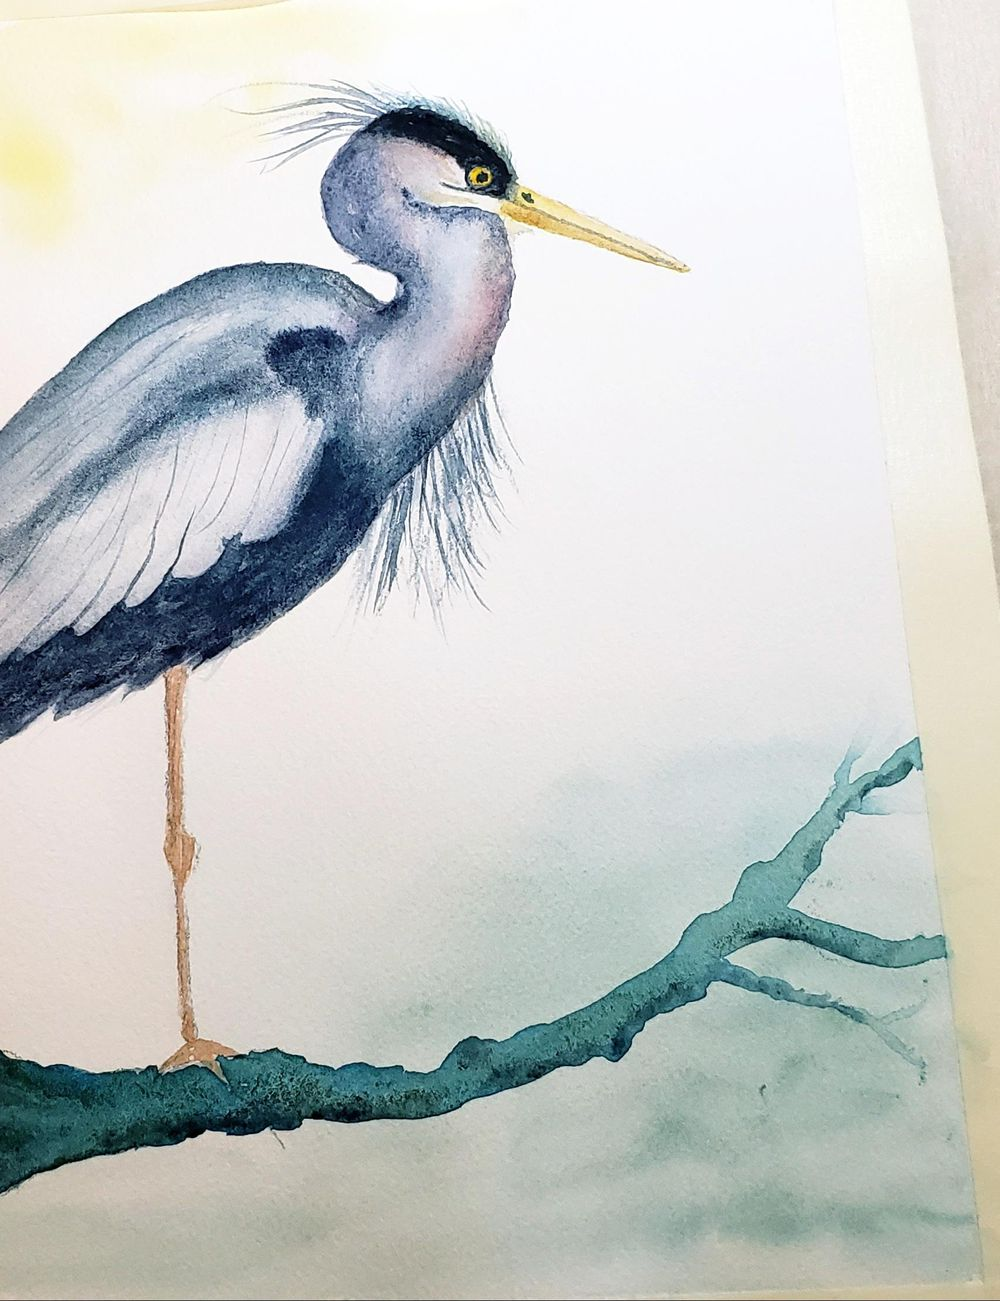 Harriett the Heron - image 1 - student project